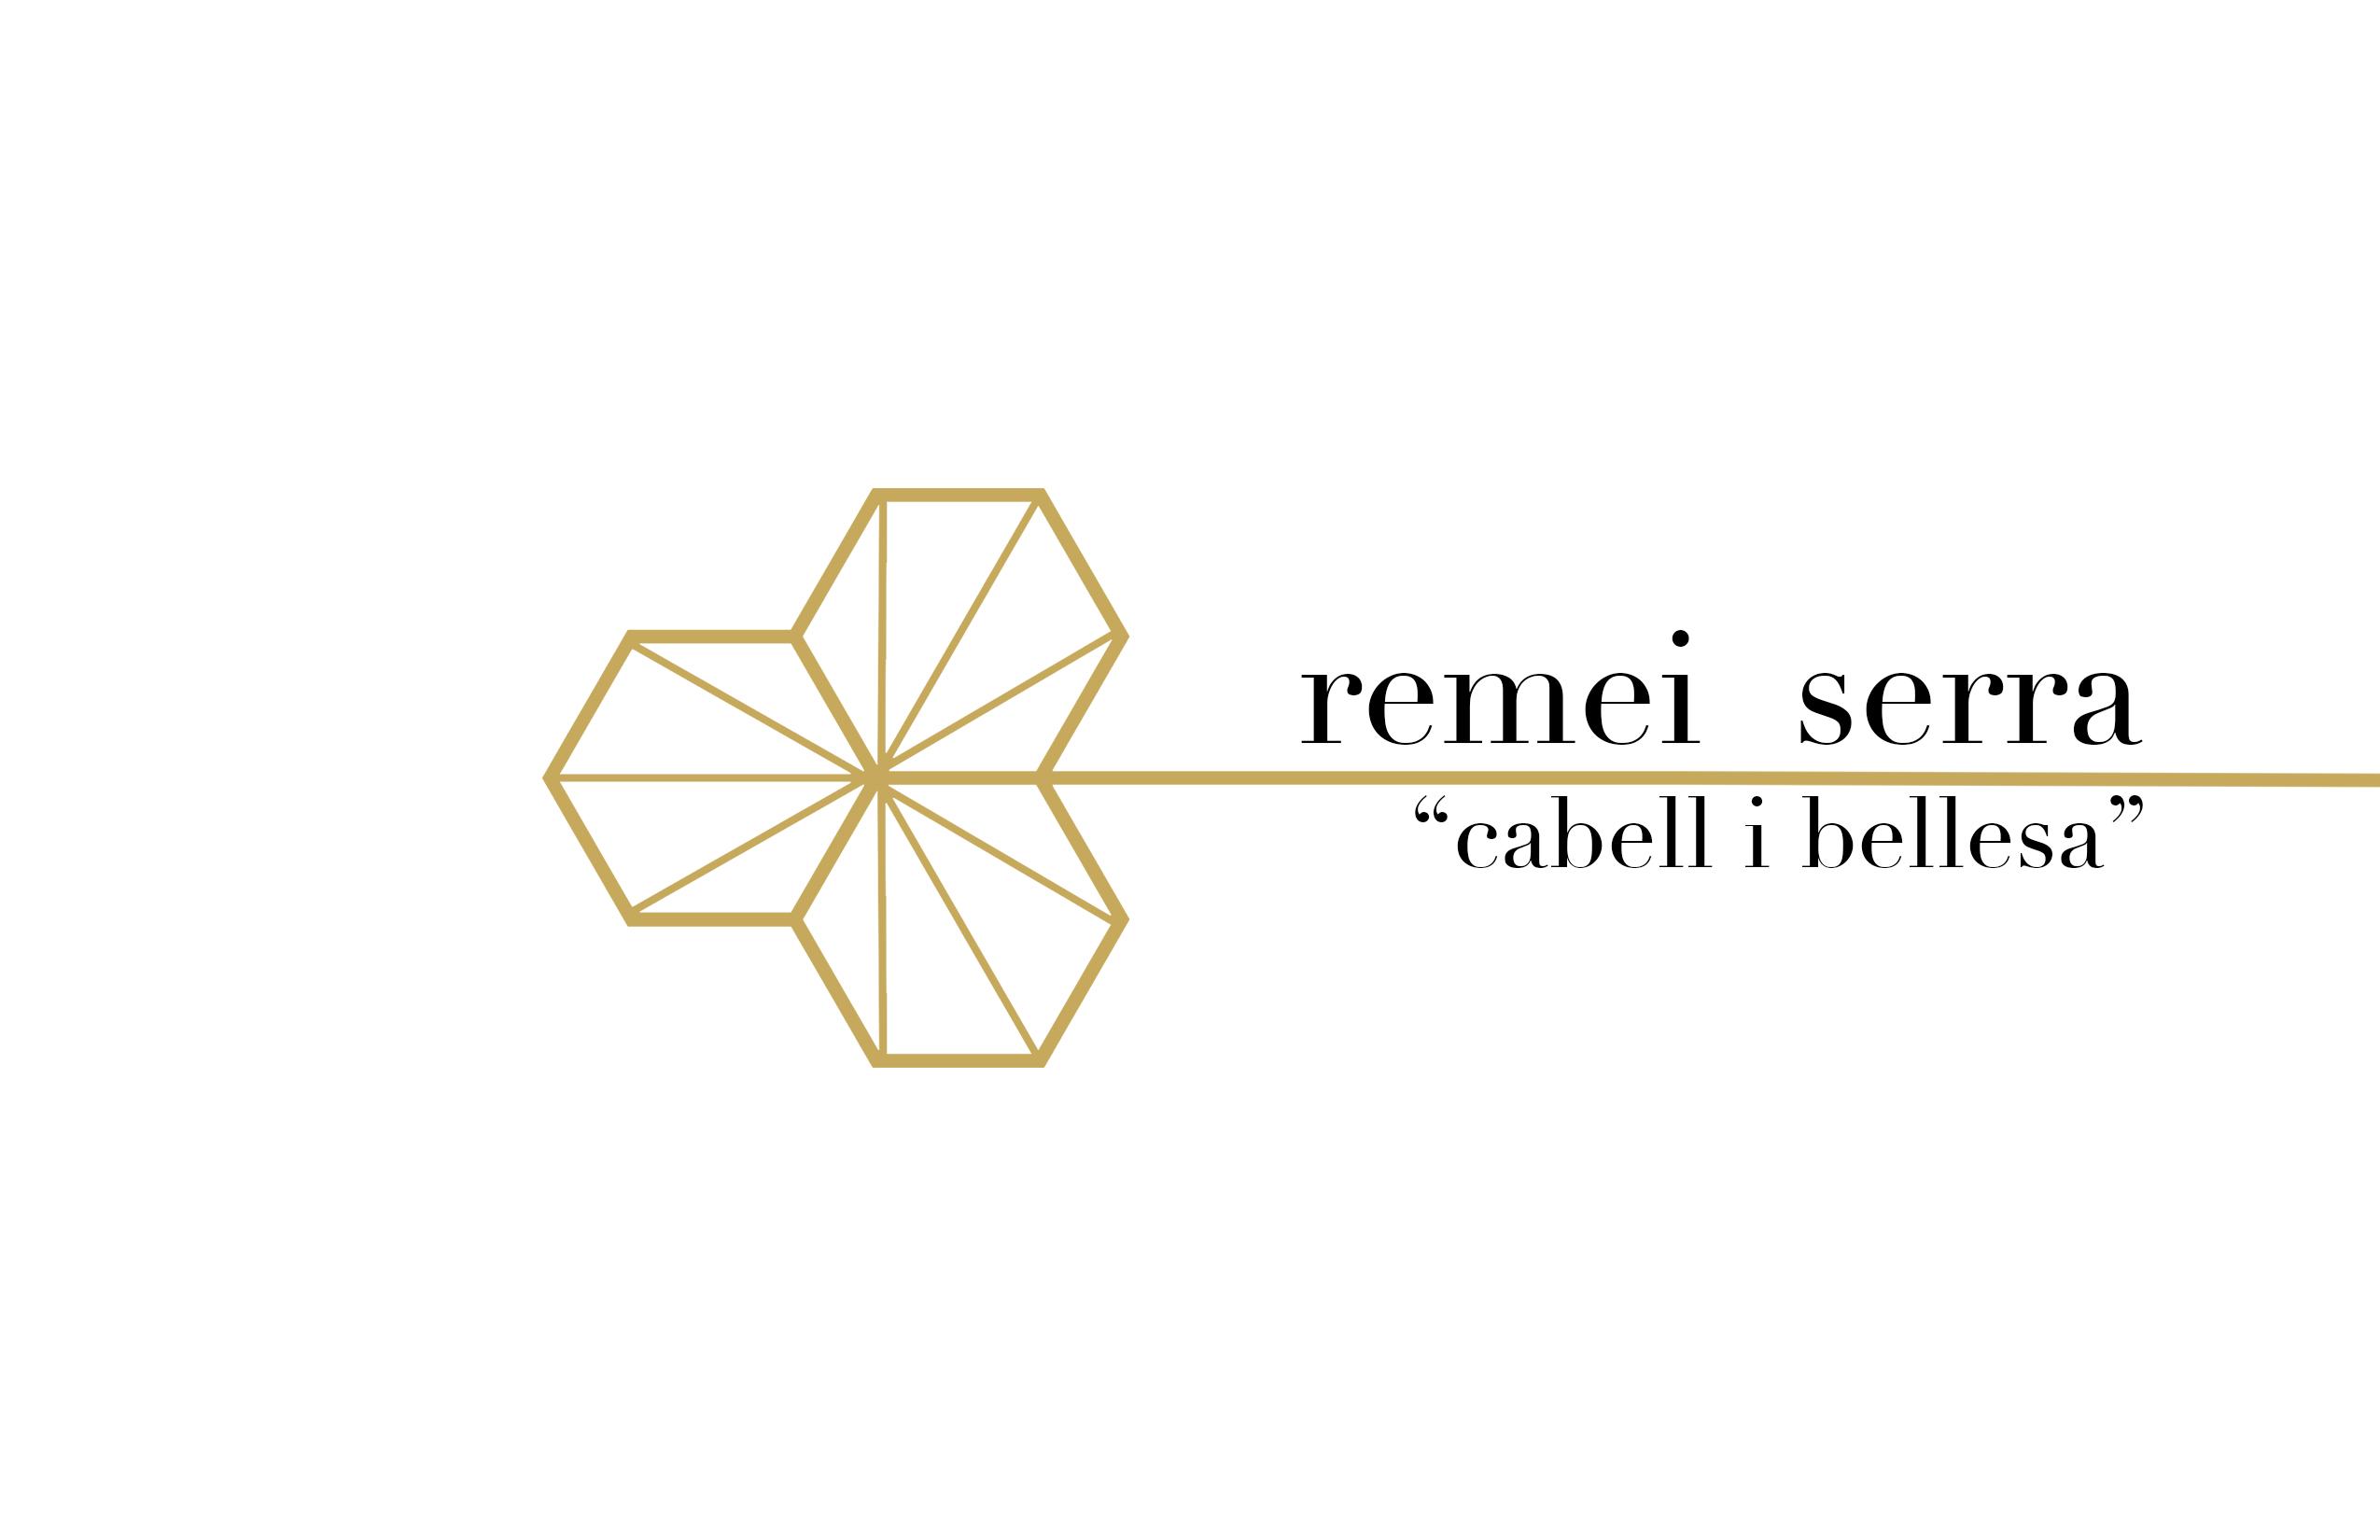 Perruqueria Remei Serra Cabell I Bellesa